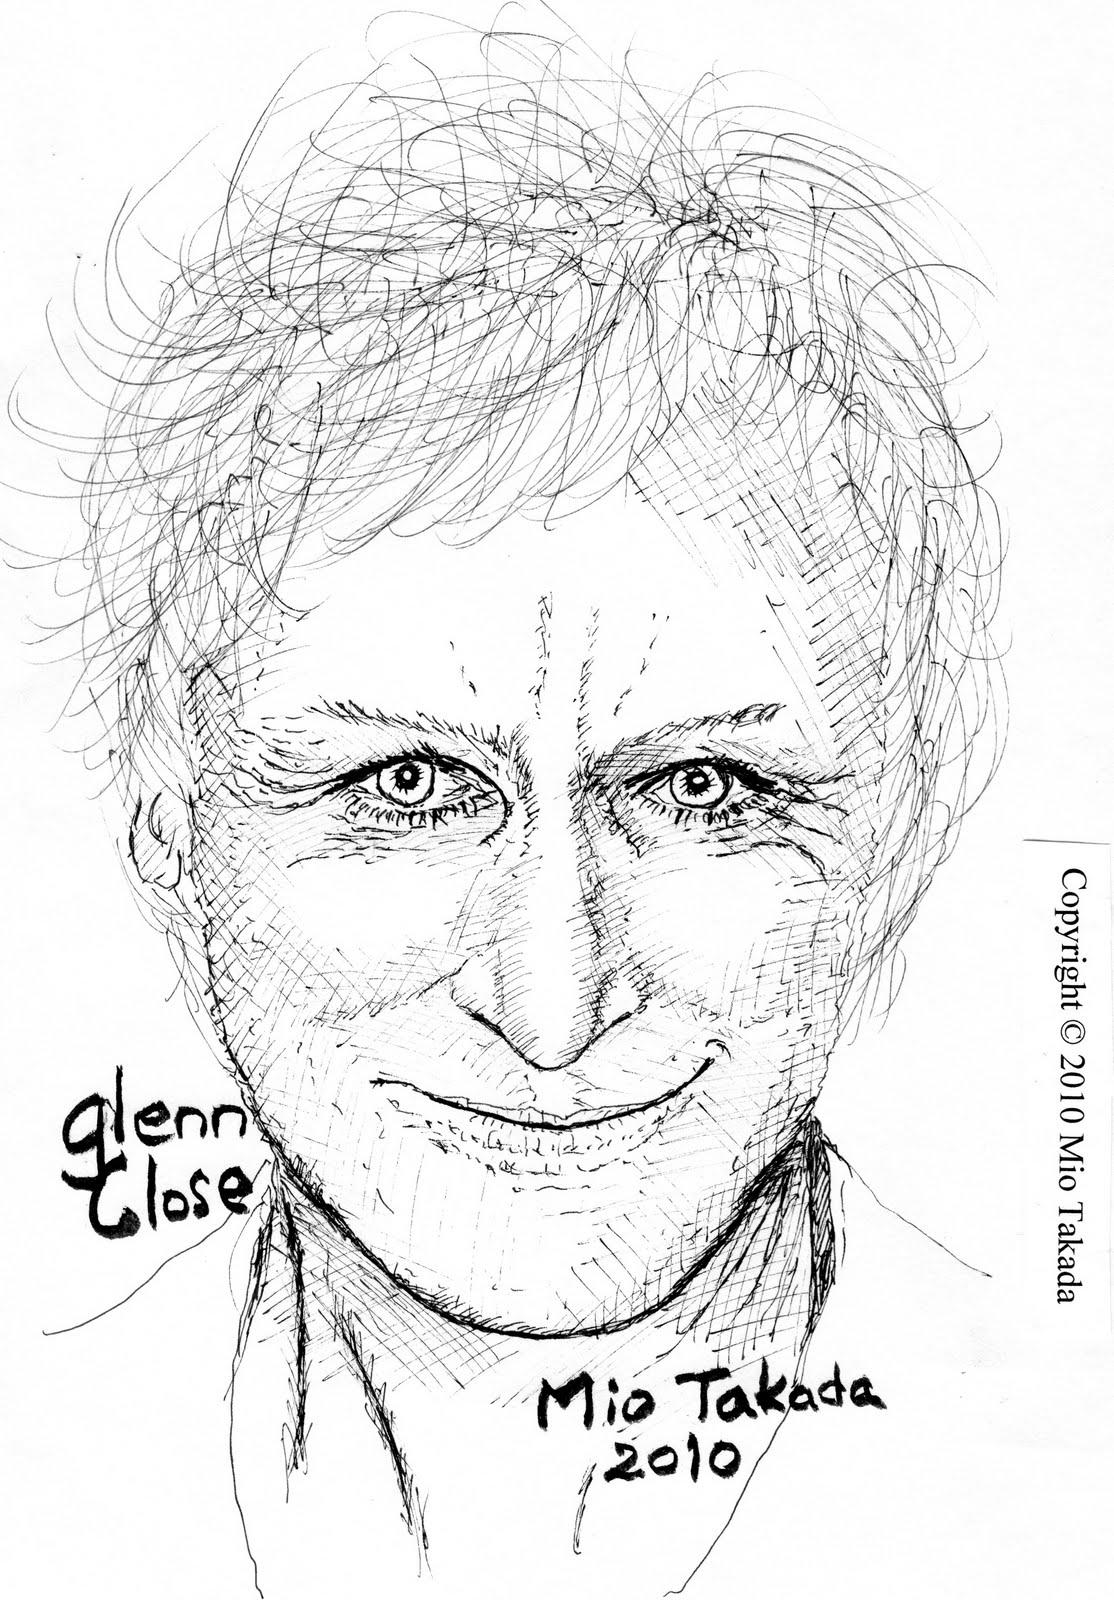 Glenn Close's quote #2